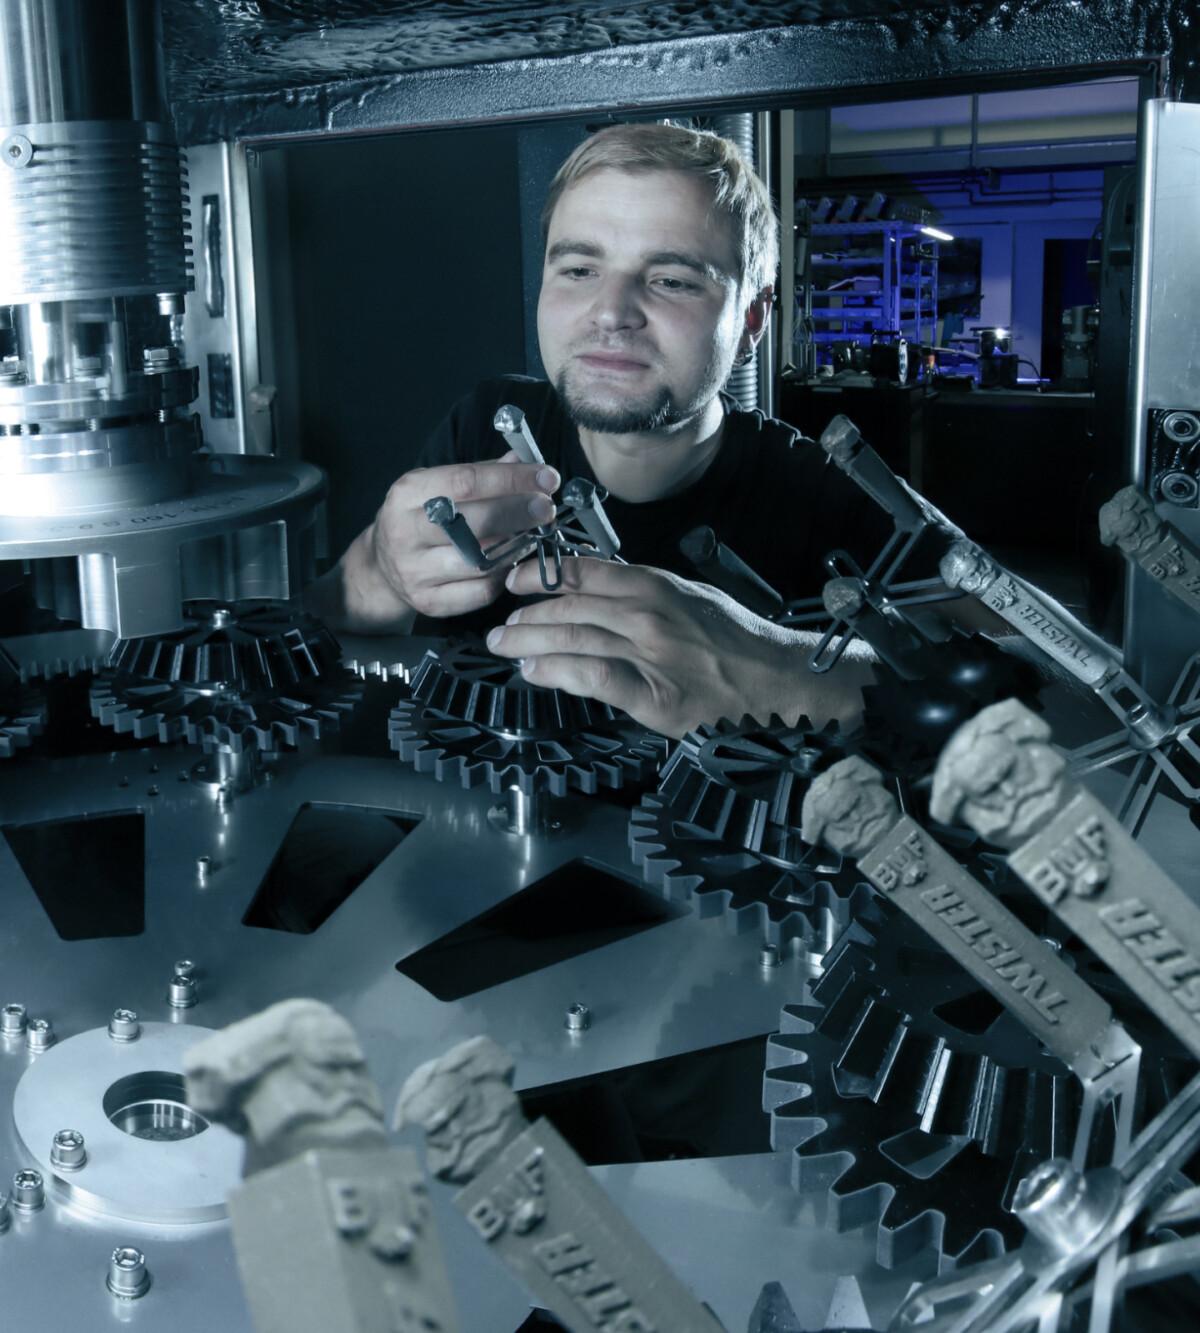 Industrial equipment engineer working on parts